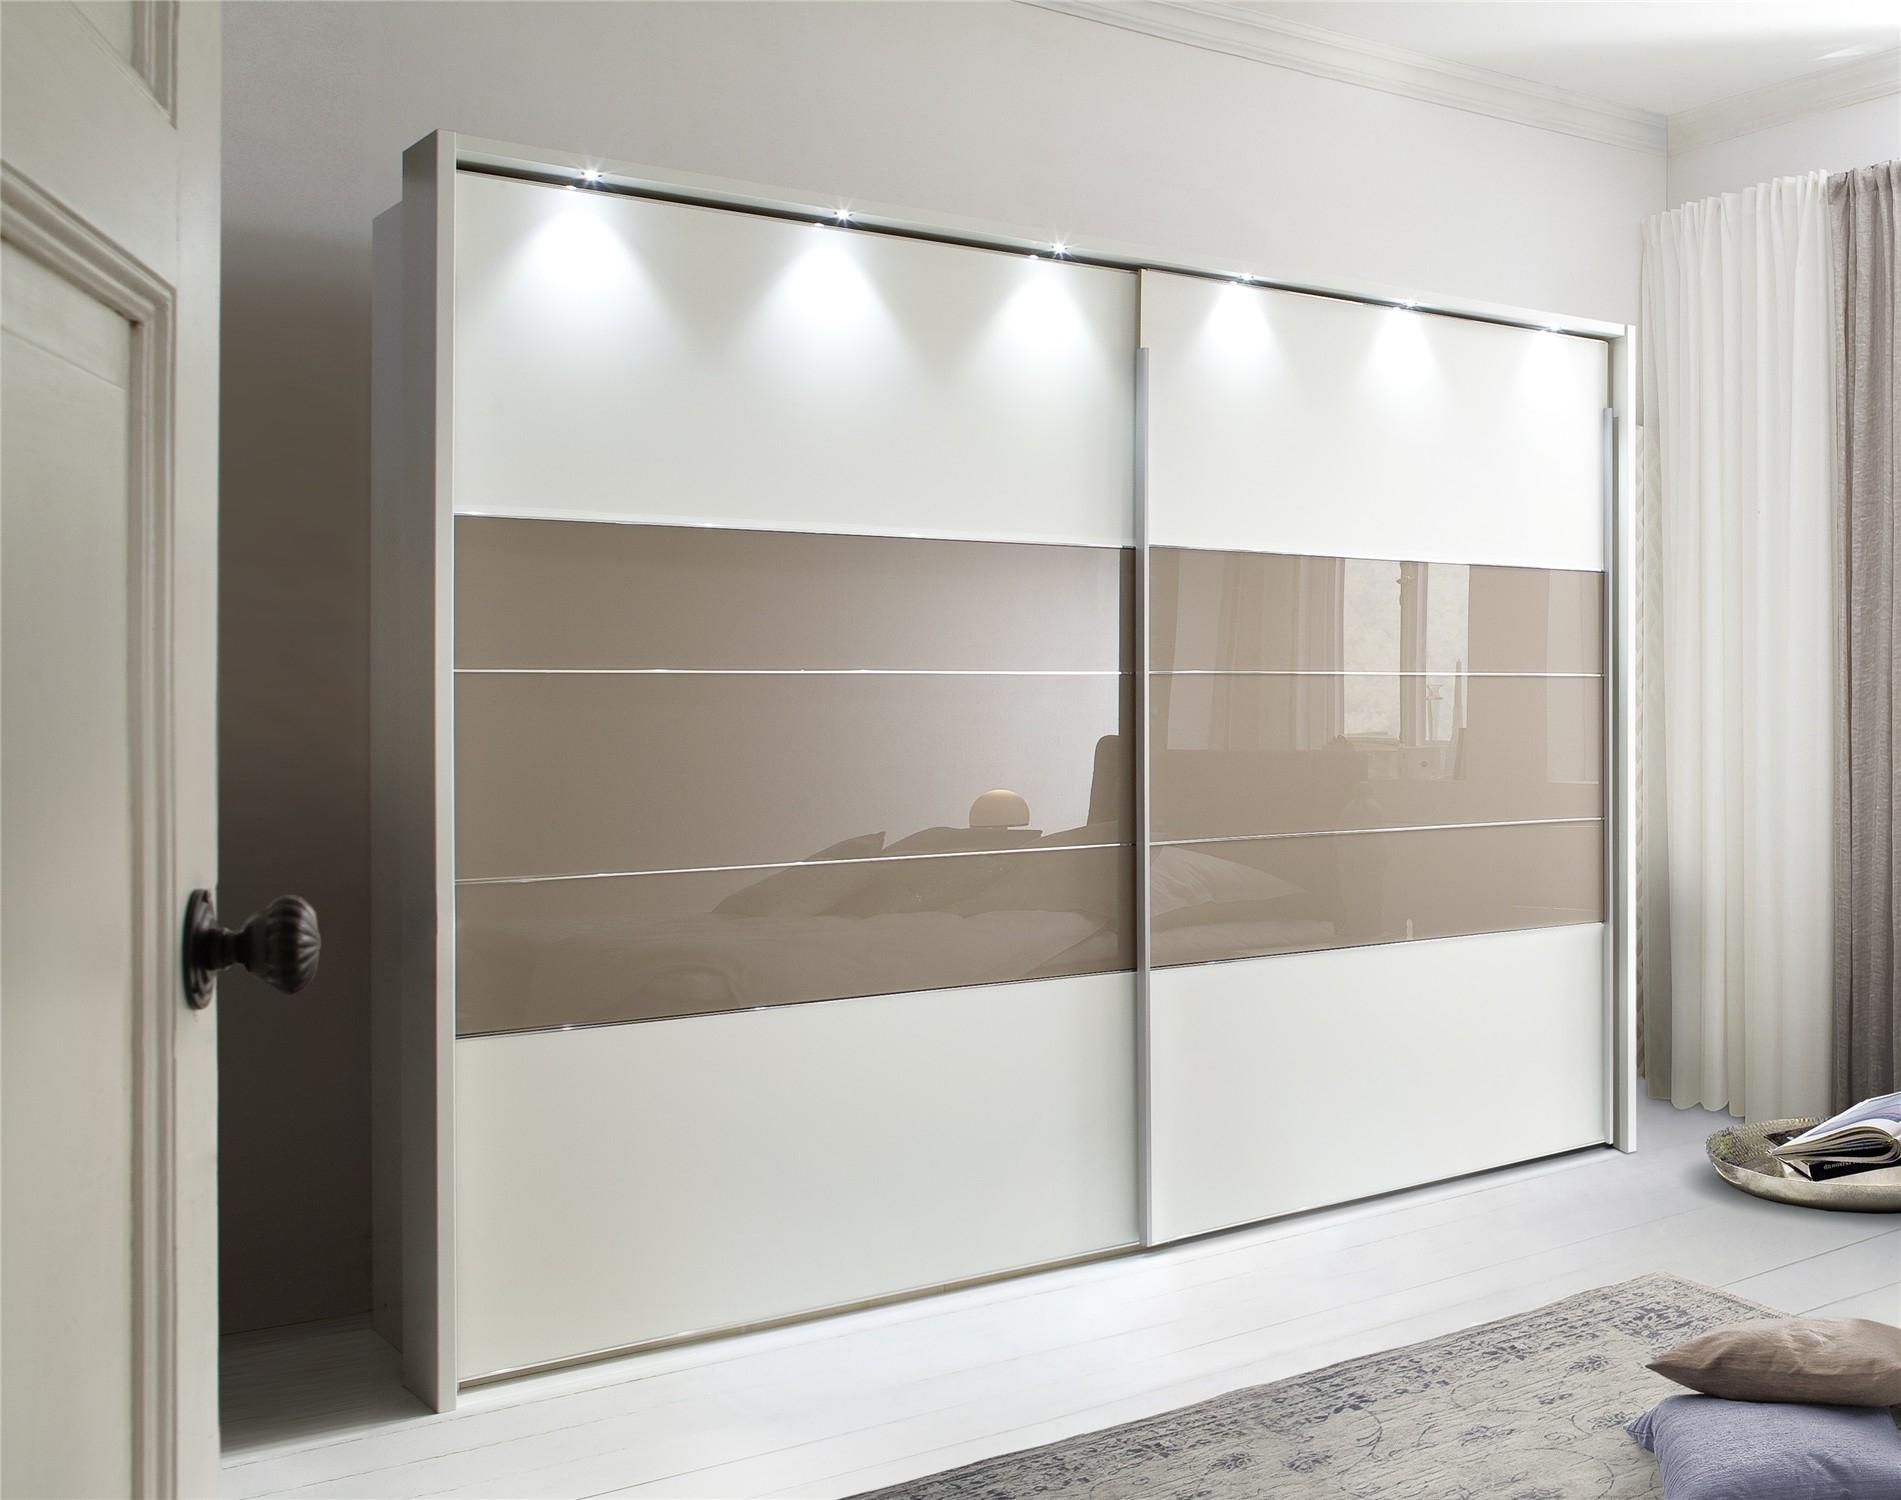 Oak Finish Sliding Closet Doors1901 X 1500